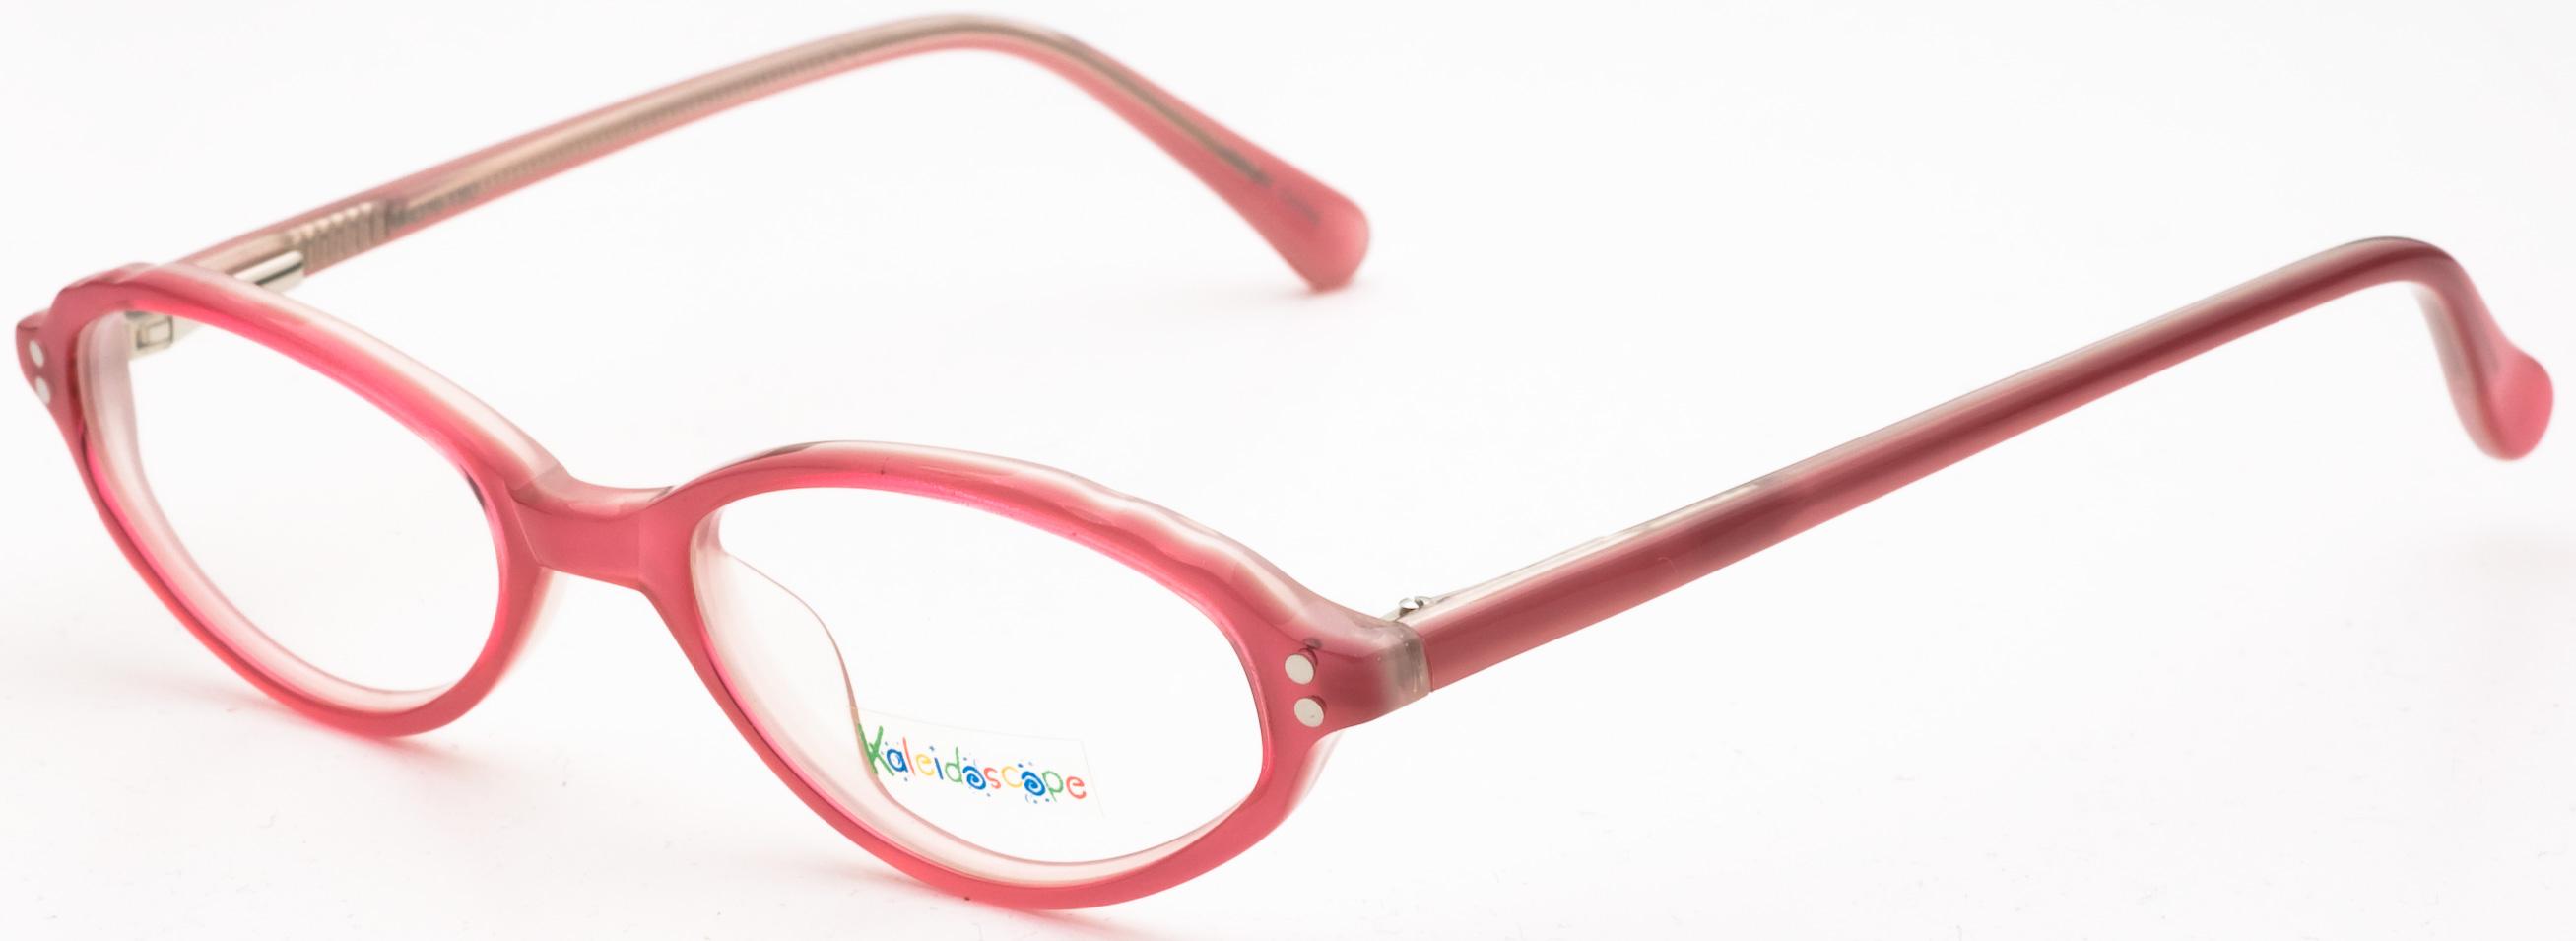 Kaleidoscope 4010 Eyeglasses, Pink